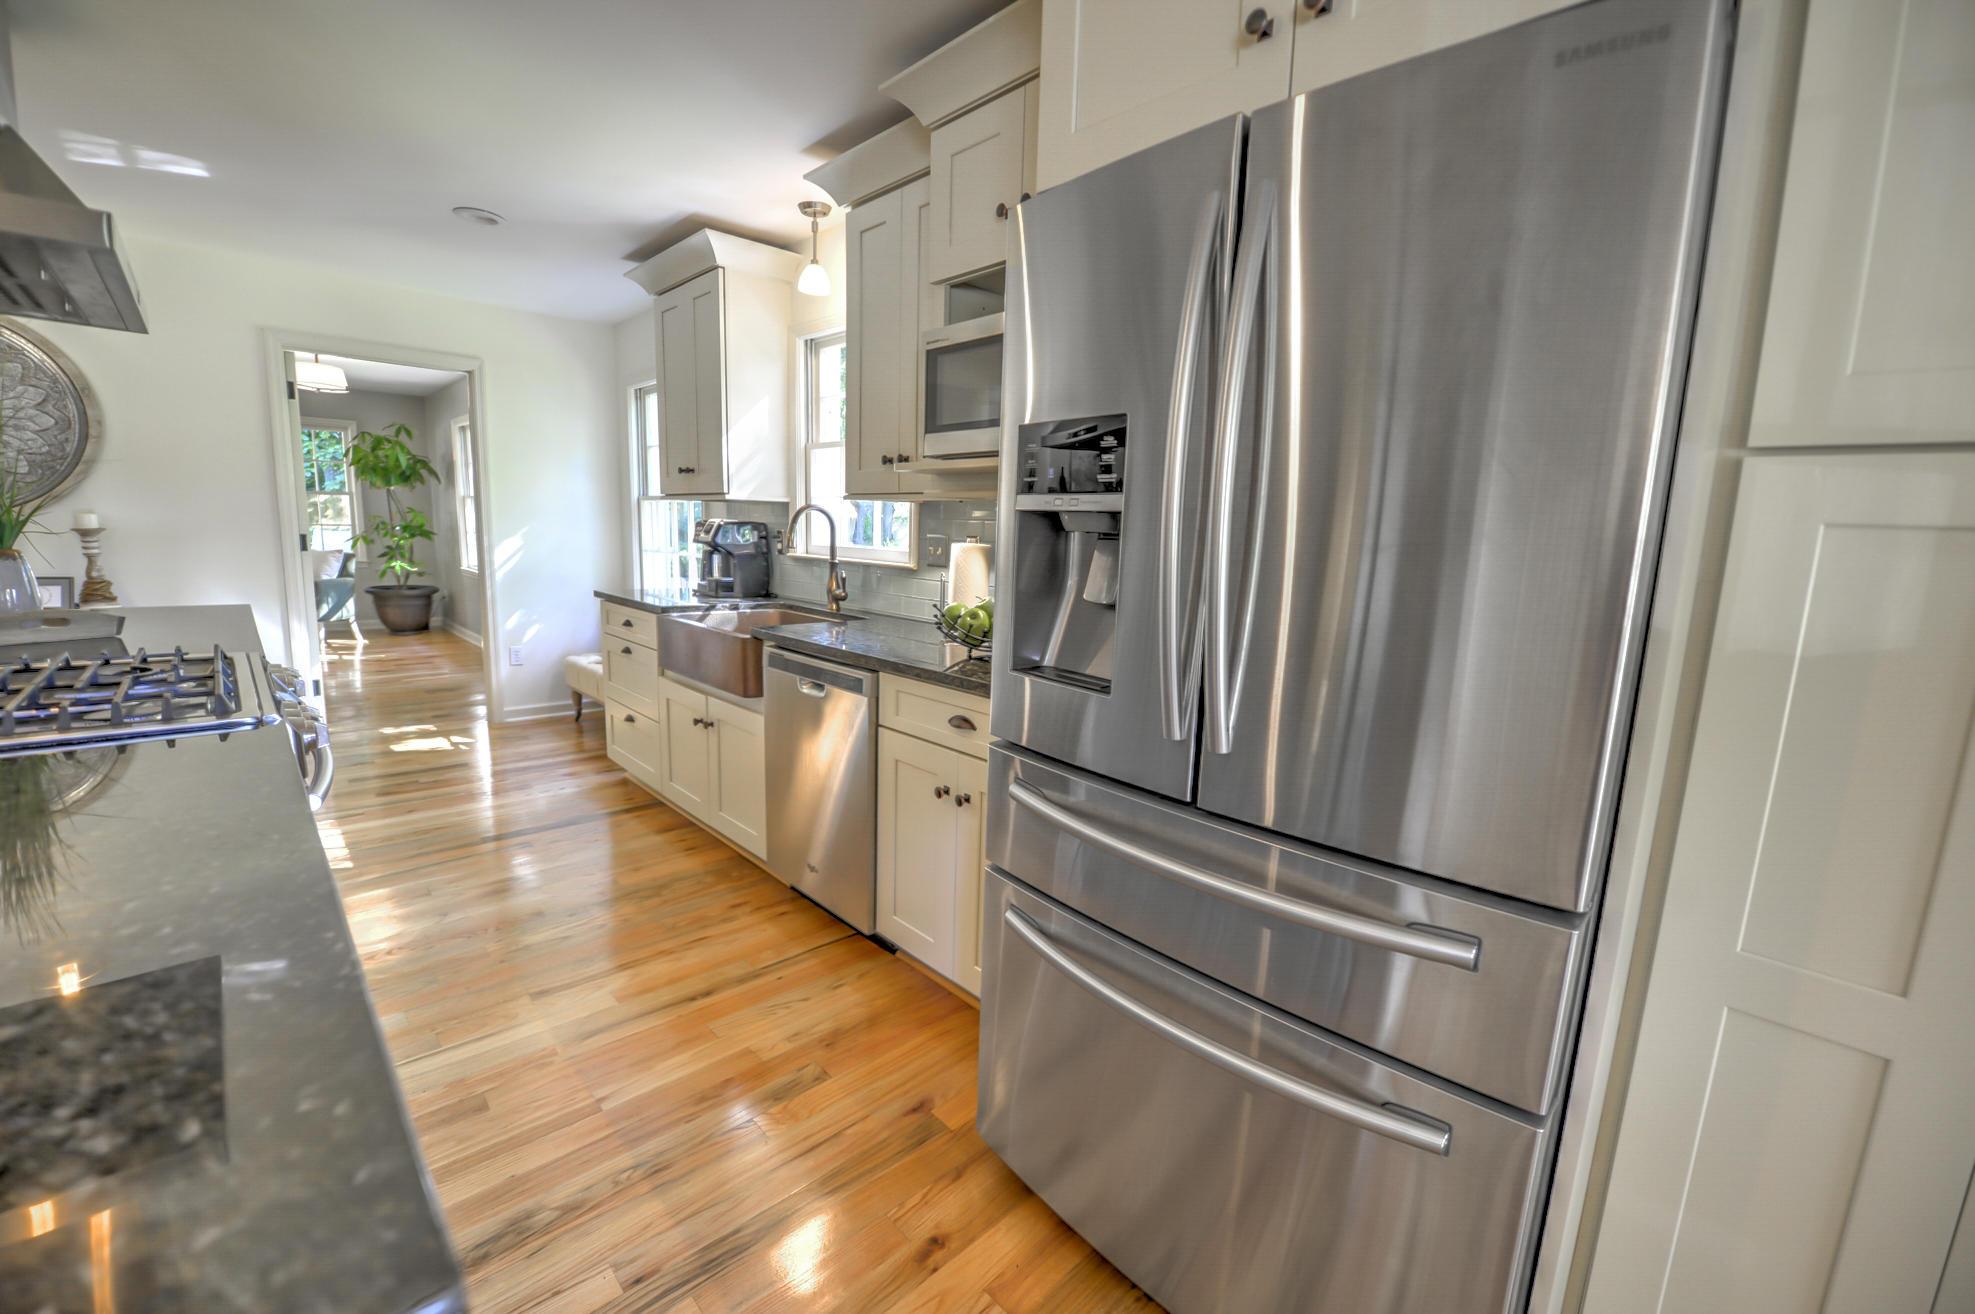 Shemwood II Homes For Sale - 1017 Jack Snipe, Mount Pleasant, SC - 34